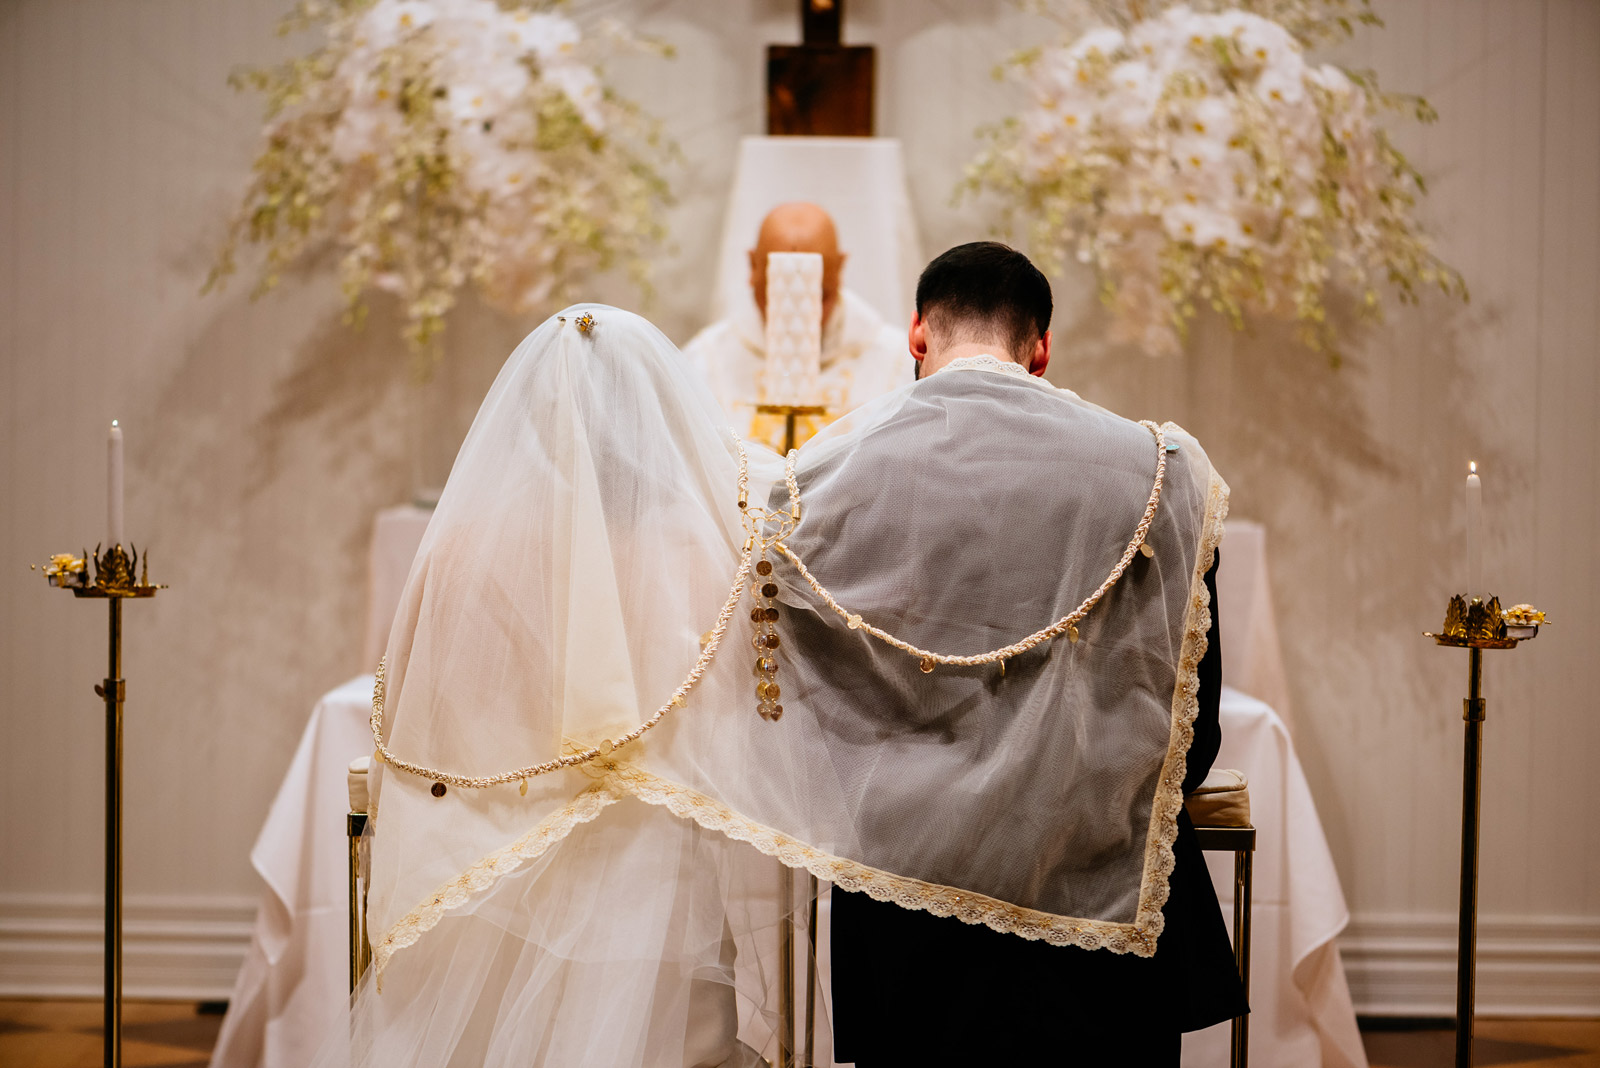 veil filipino wedding ceremony